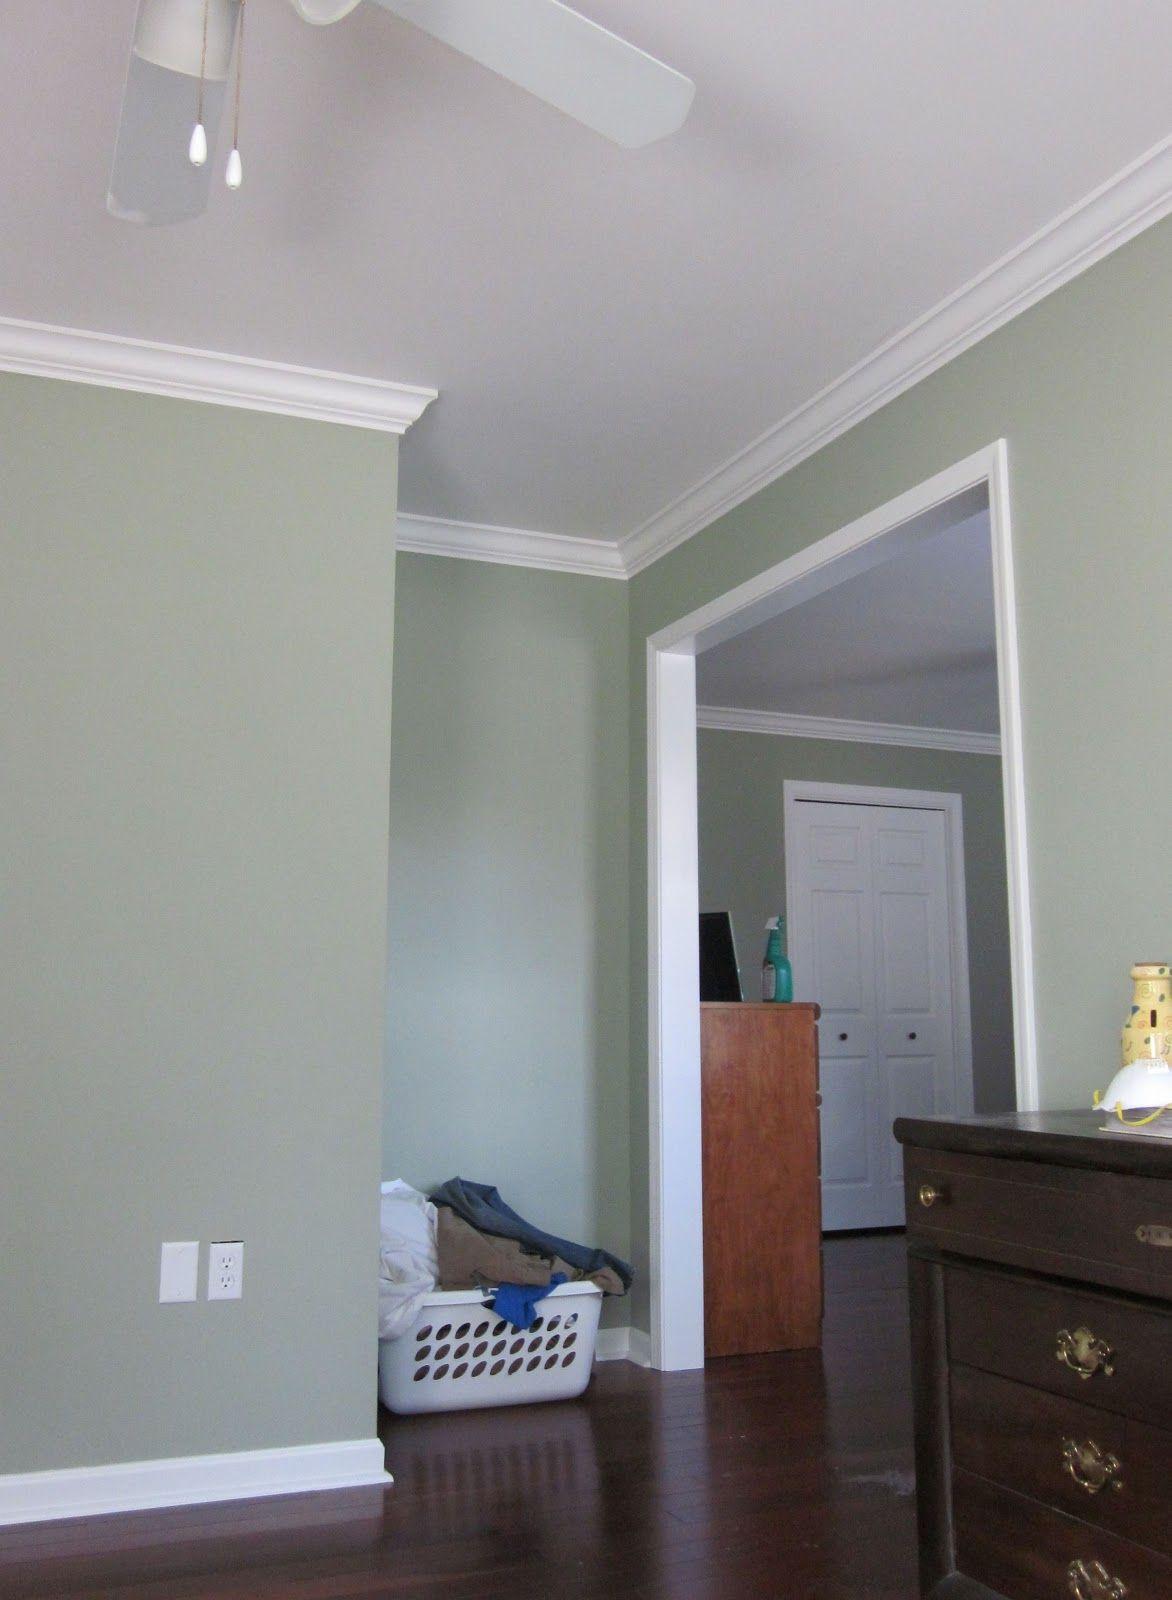 Bedroom Paint Colors, Sage Green Walls